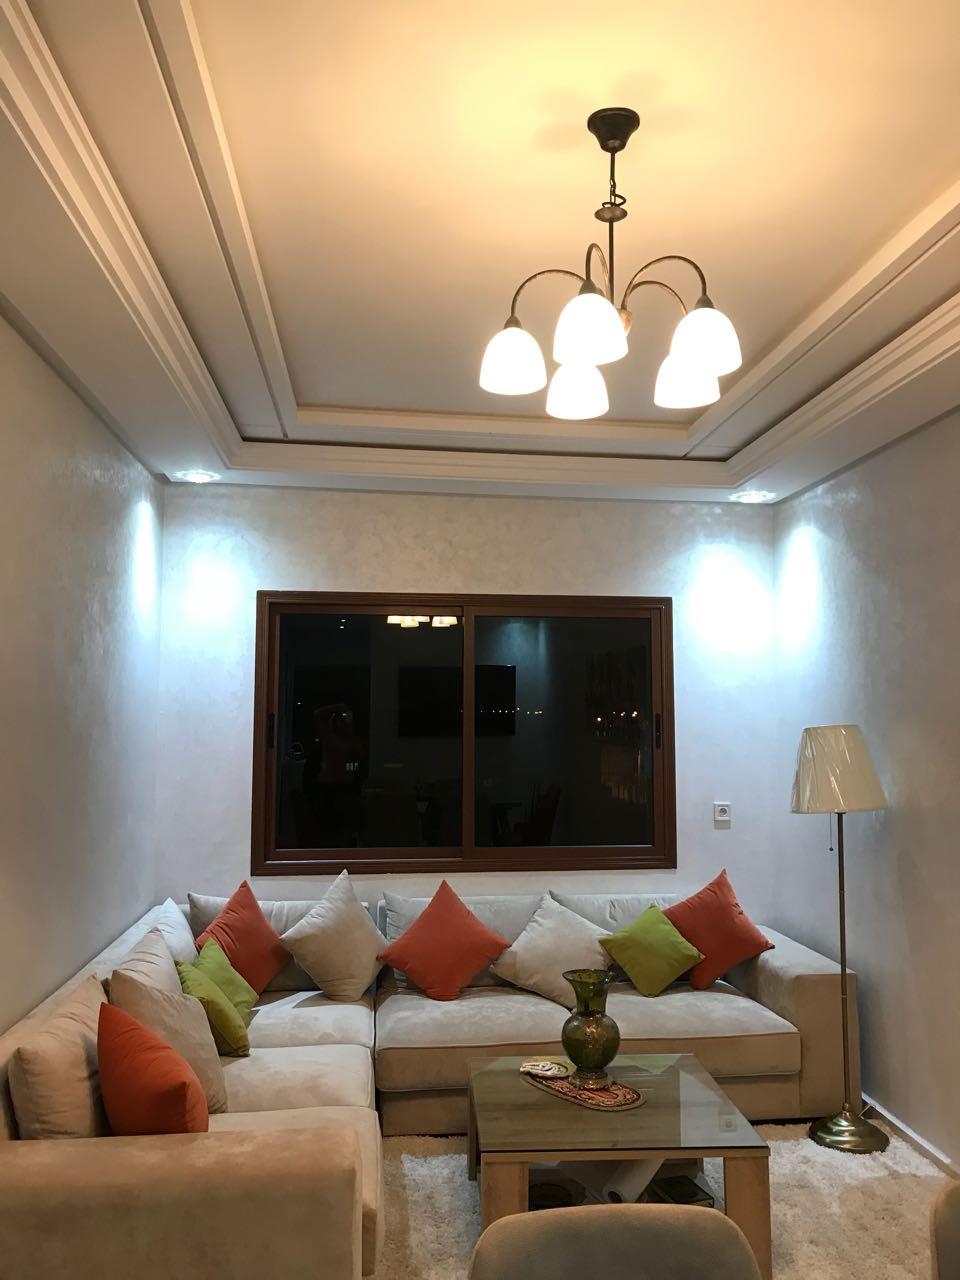 Image belle studio meublé wifi ascenseur parking ain sebaa casablanca maroc 6